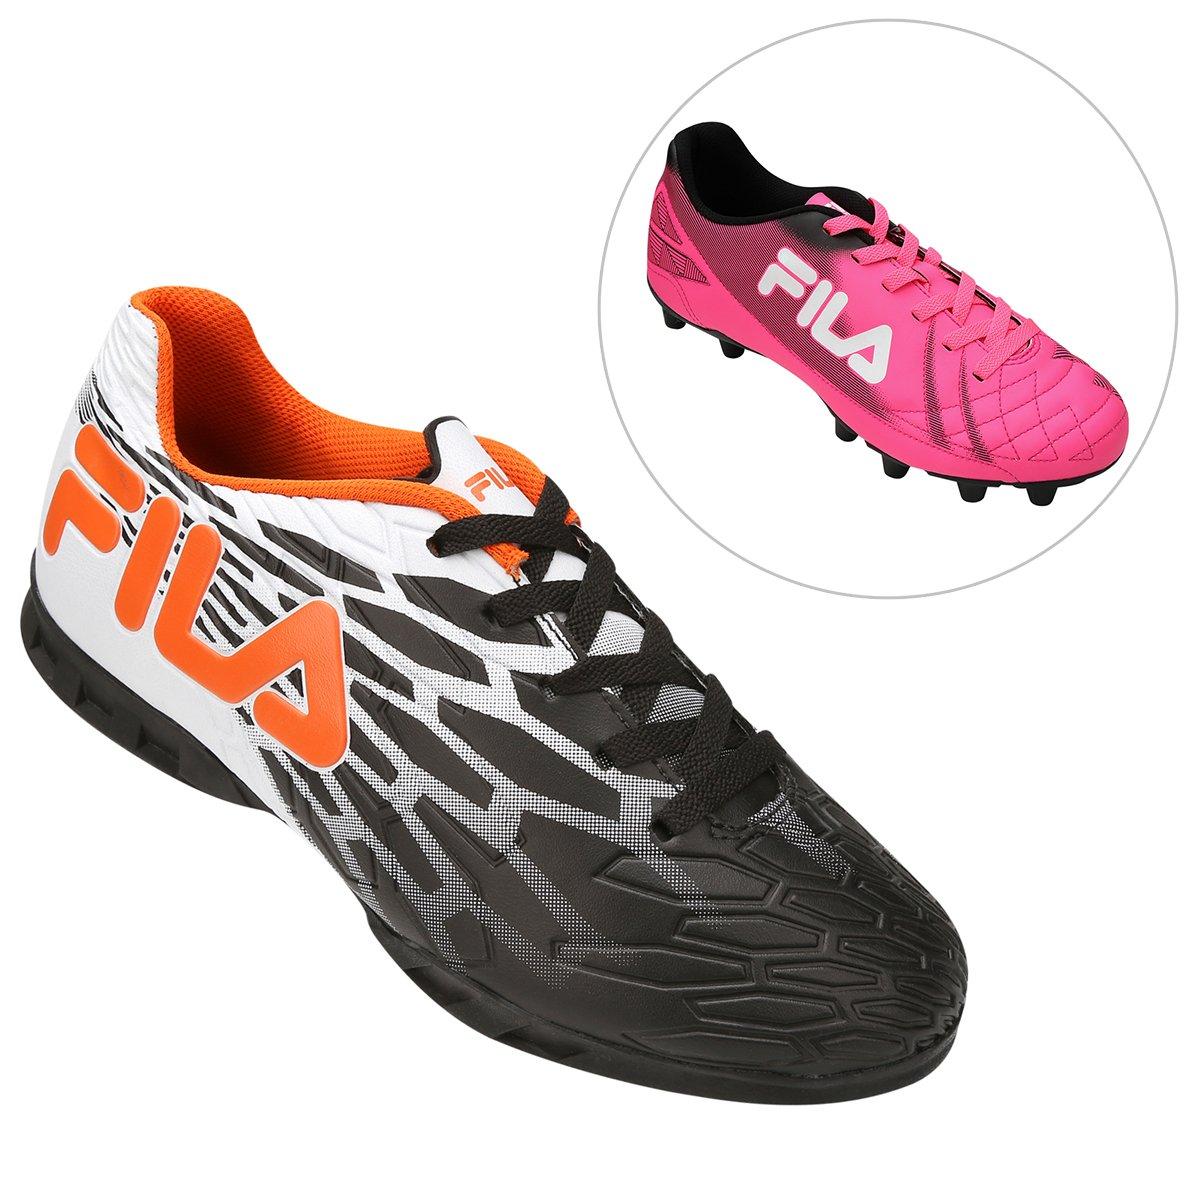 d9cf204b04 Kit Chuteira Fila Snap Futsal + Chuteira Fila Classic FG Campo - Compre  Agora